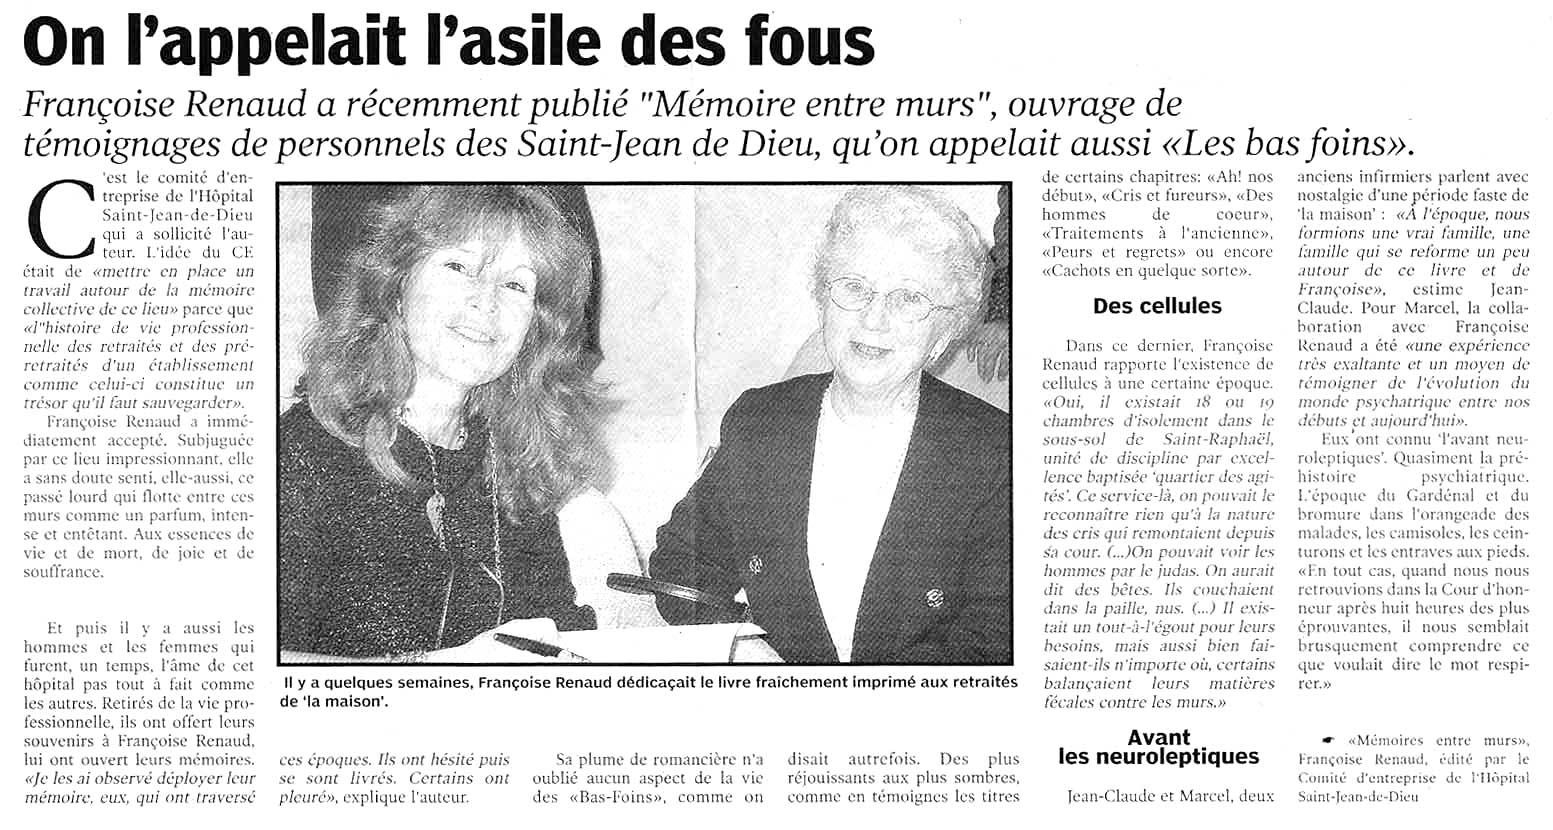 Le Petit Bleu, janv 2004